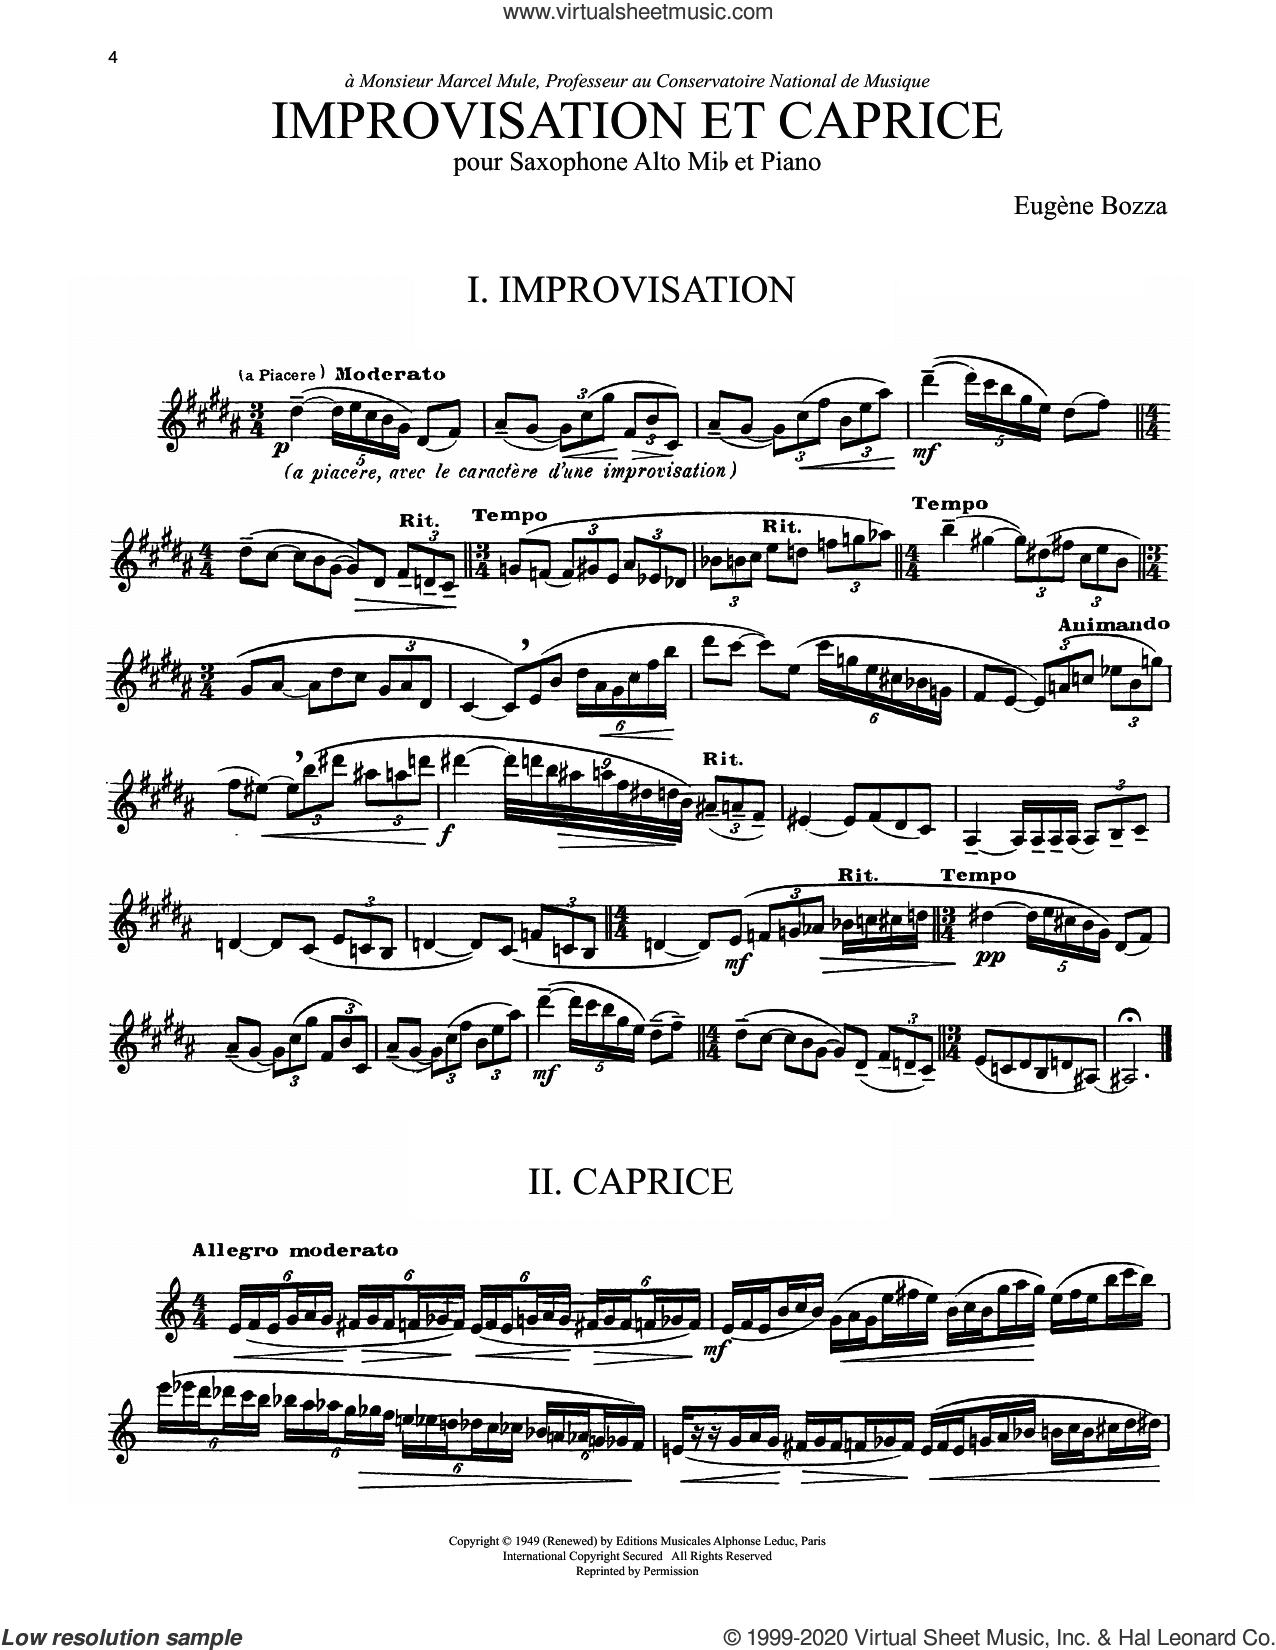 Improvisation Et Caprice sheet music for alto saxophone solo by Eugene Bozza, Nicole Roman and Eugene Bozza, classical score, intermediate skill level